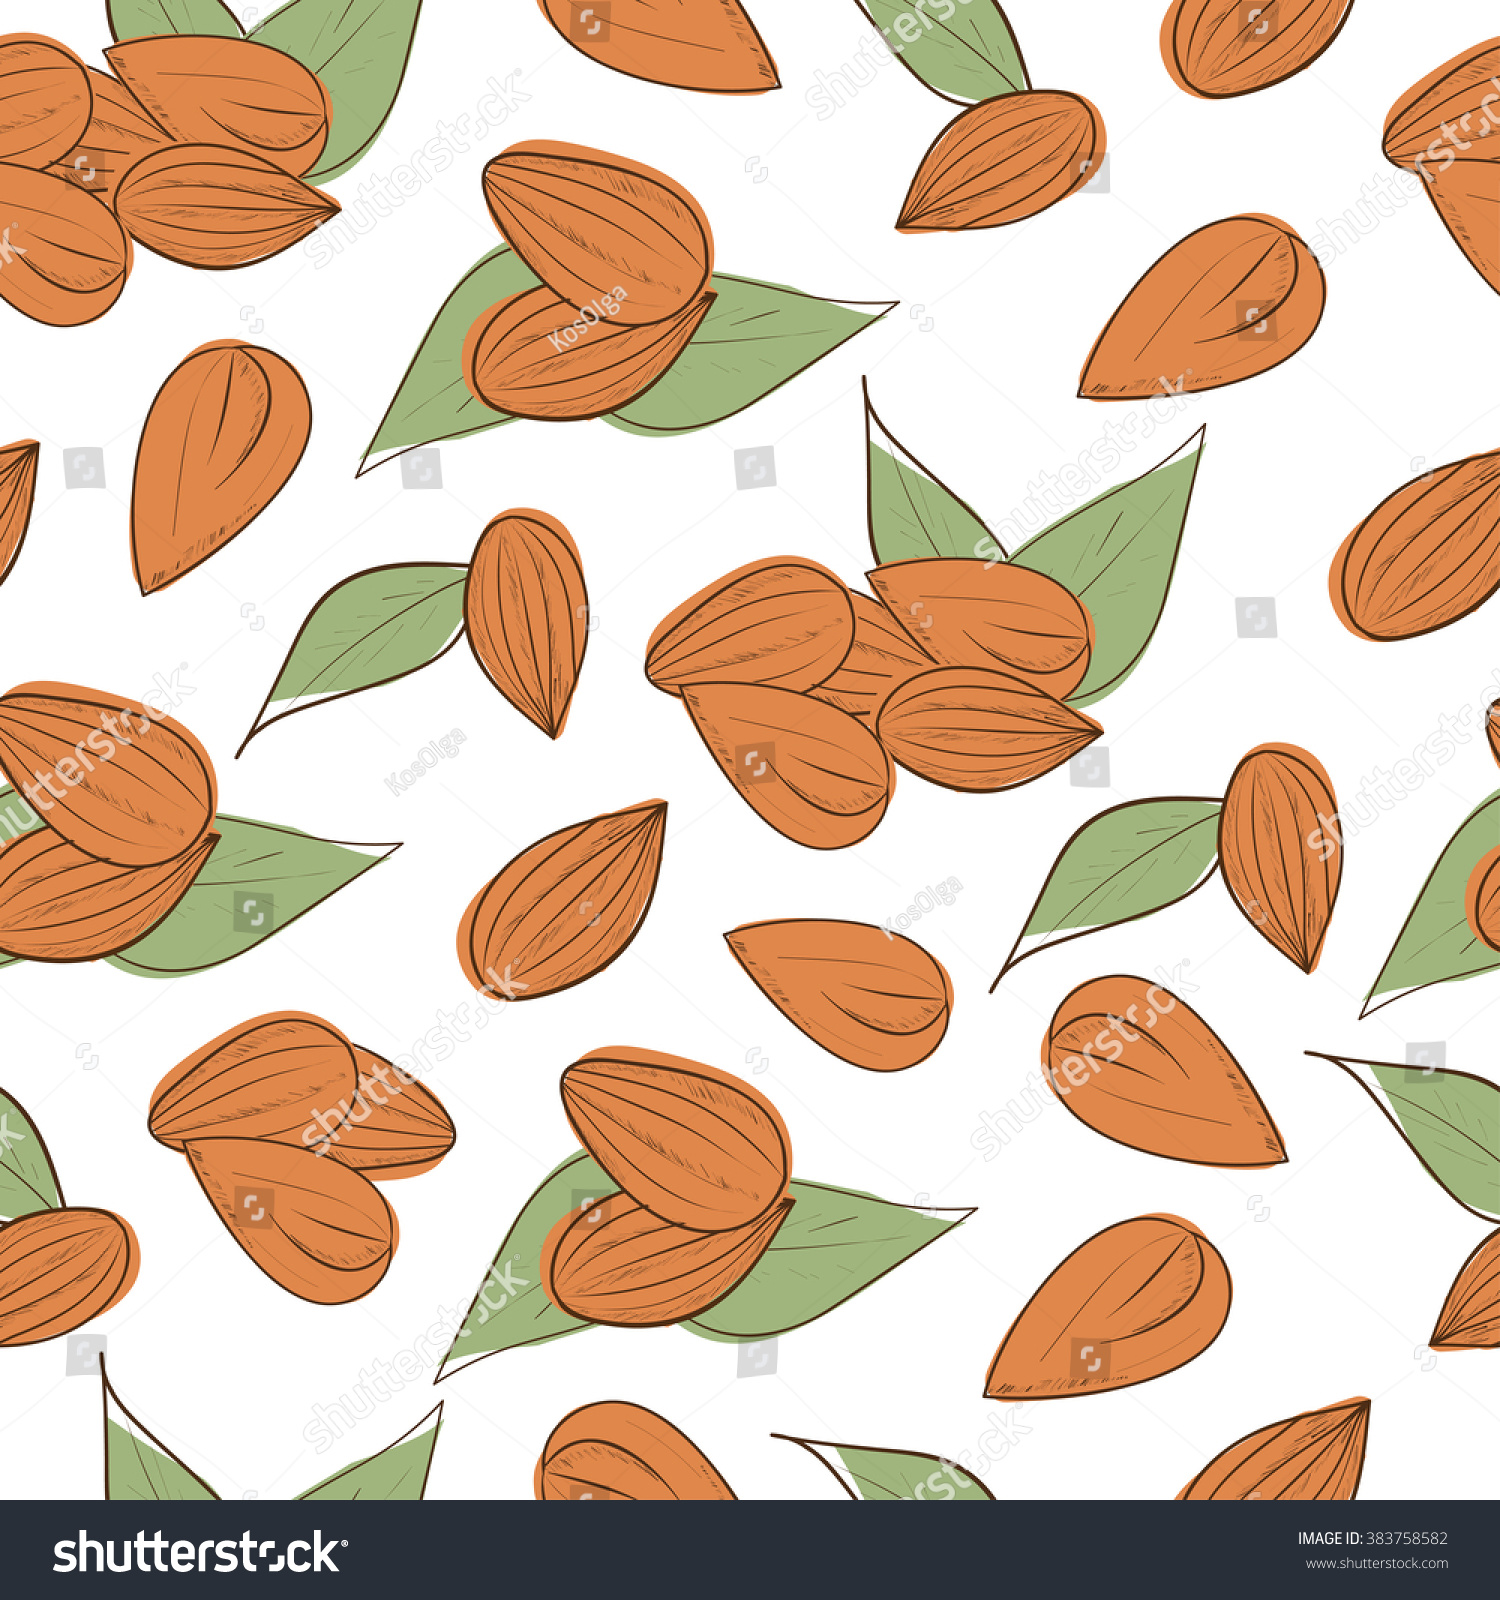 almond nut background wallpaper texture seamless stock illustration